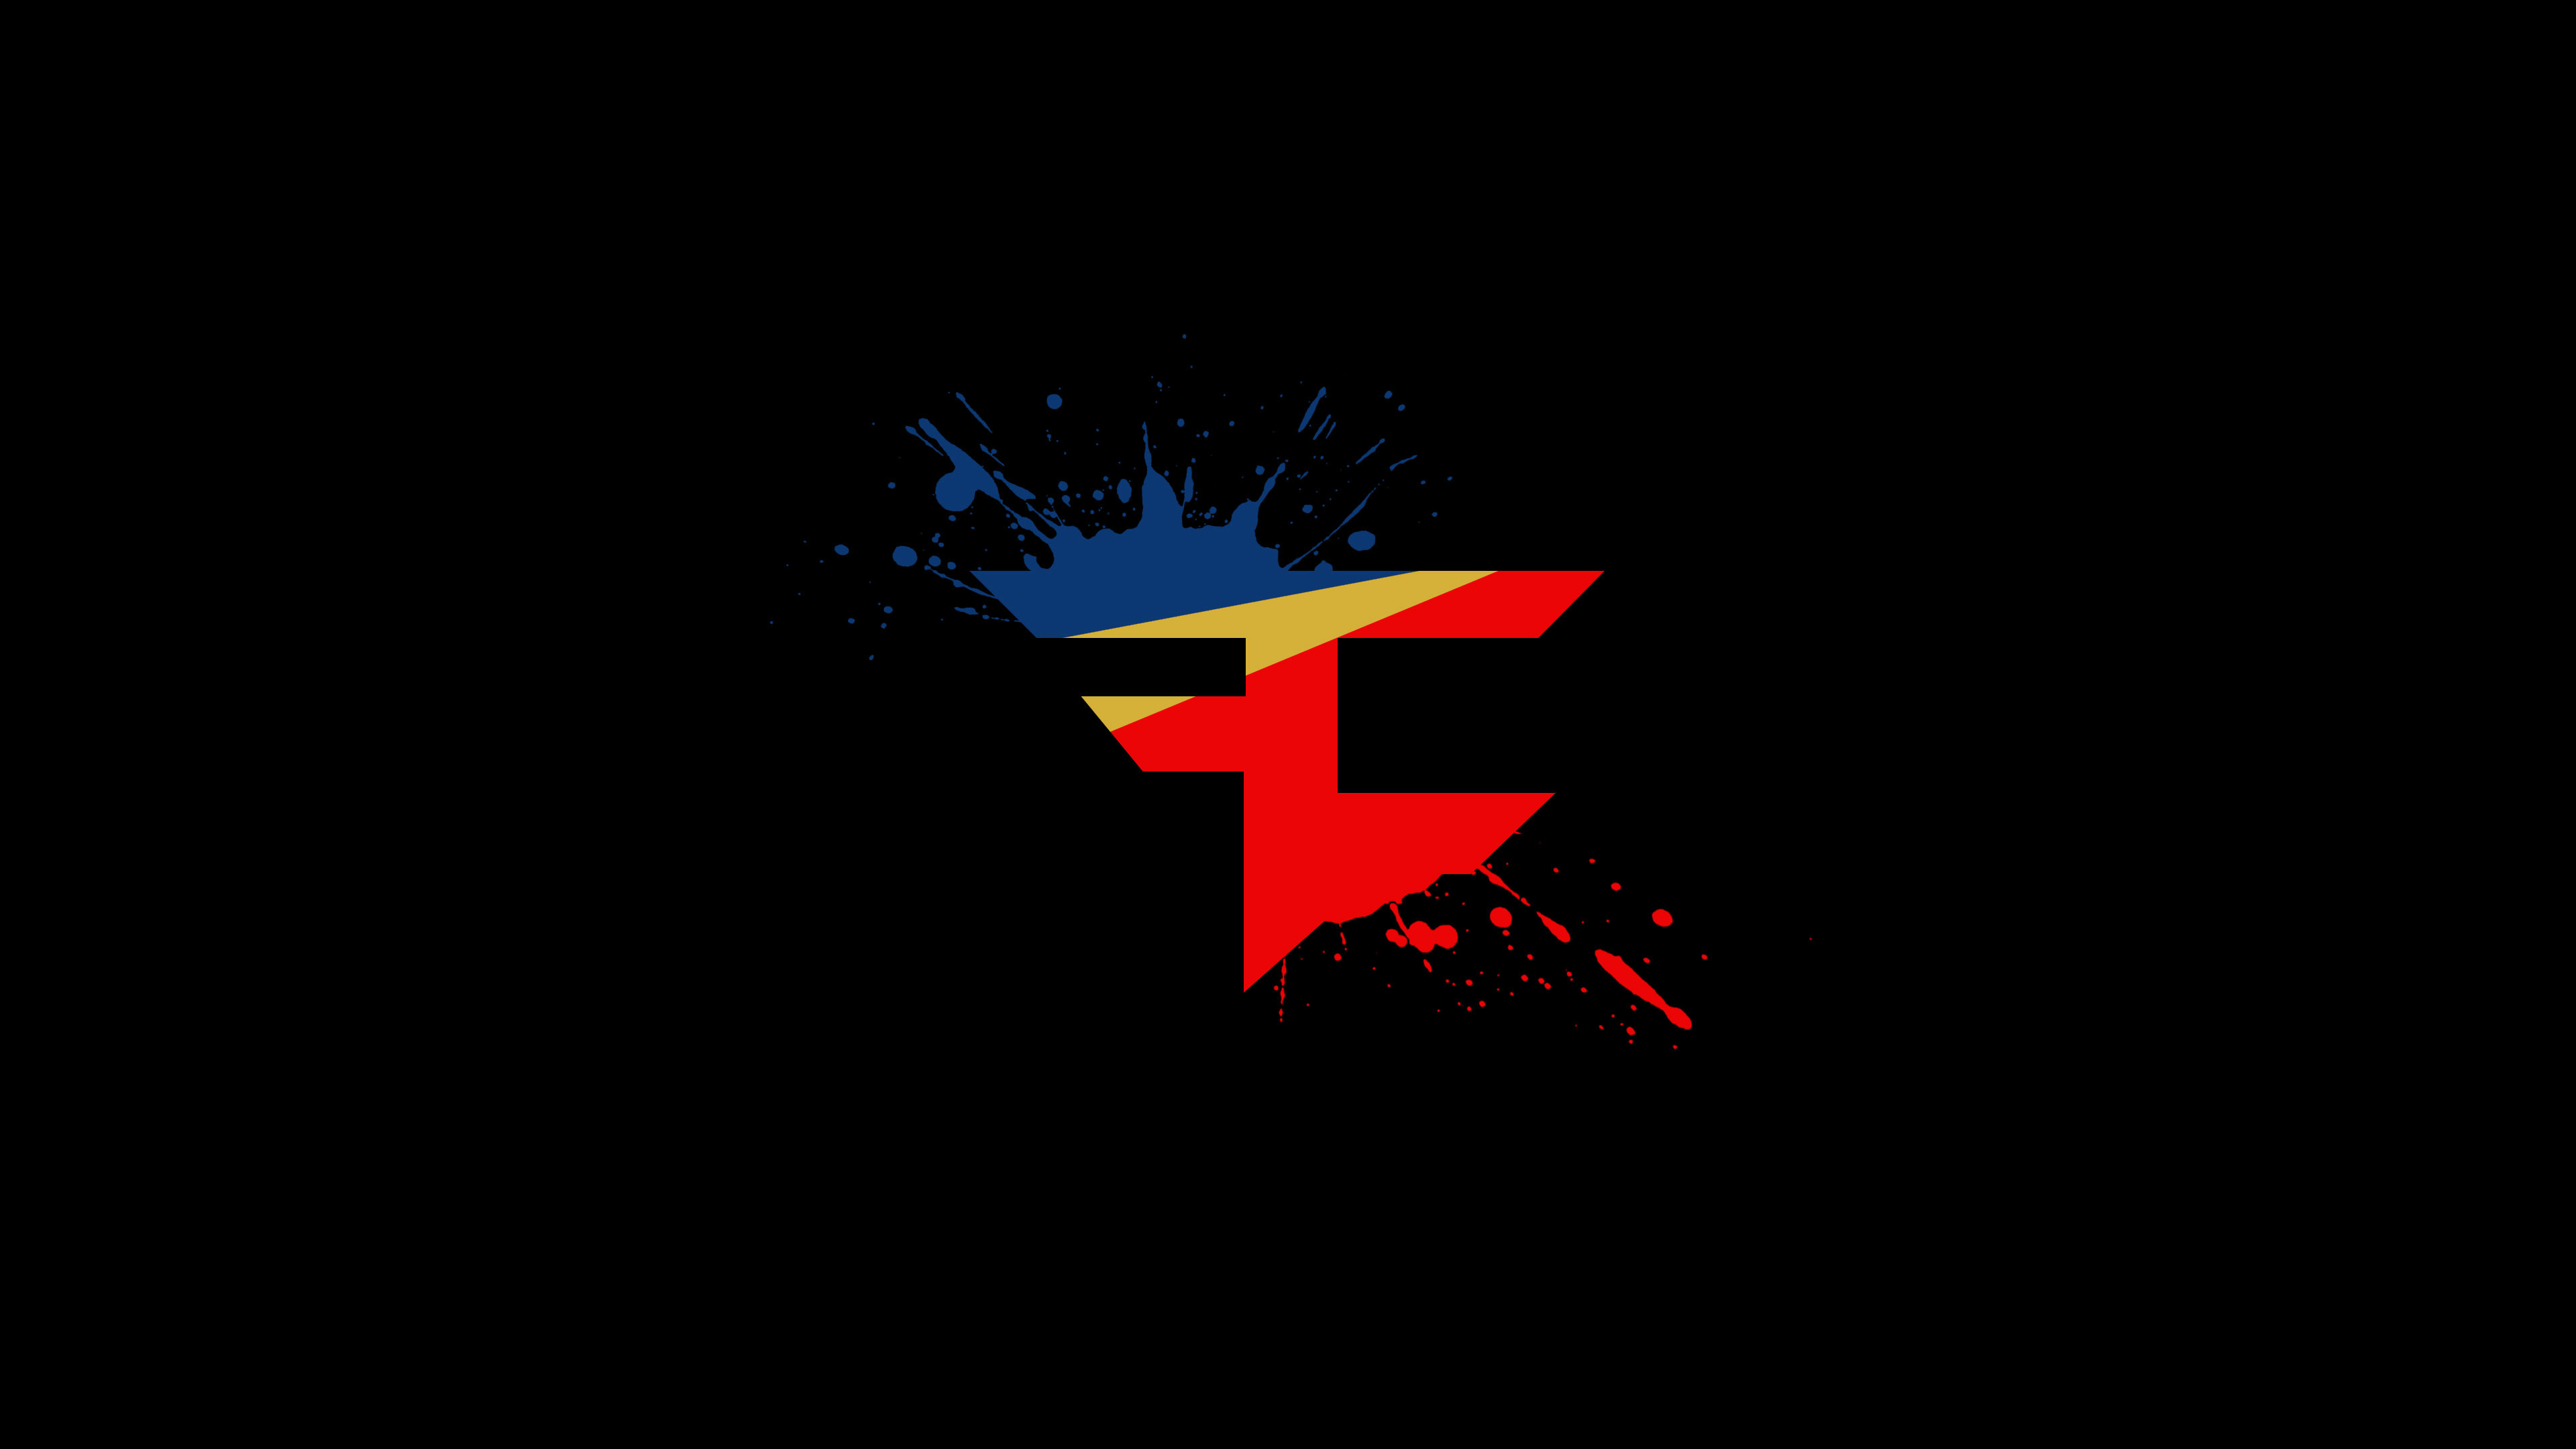 FaZe Clan 2.0